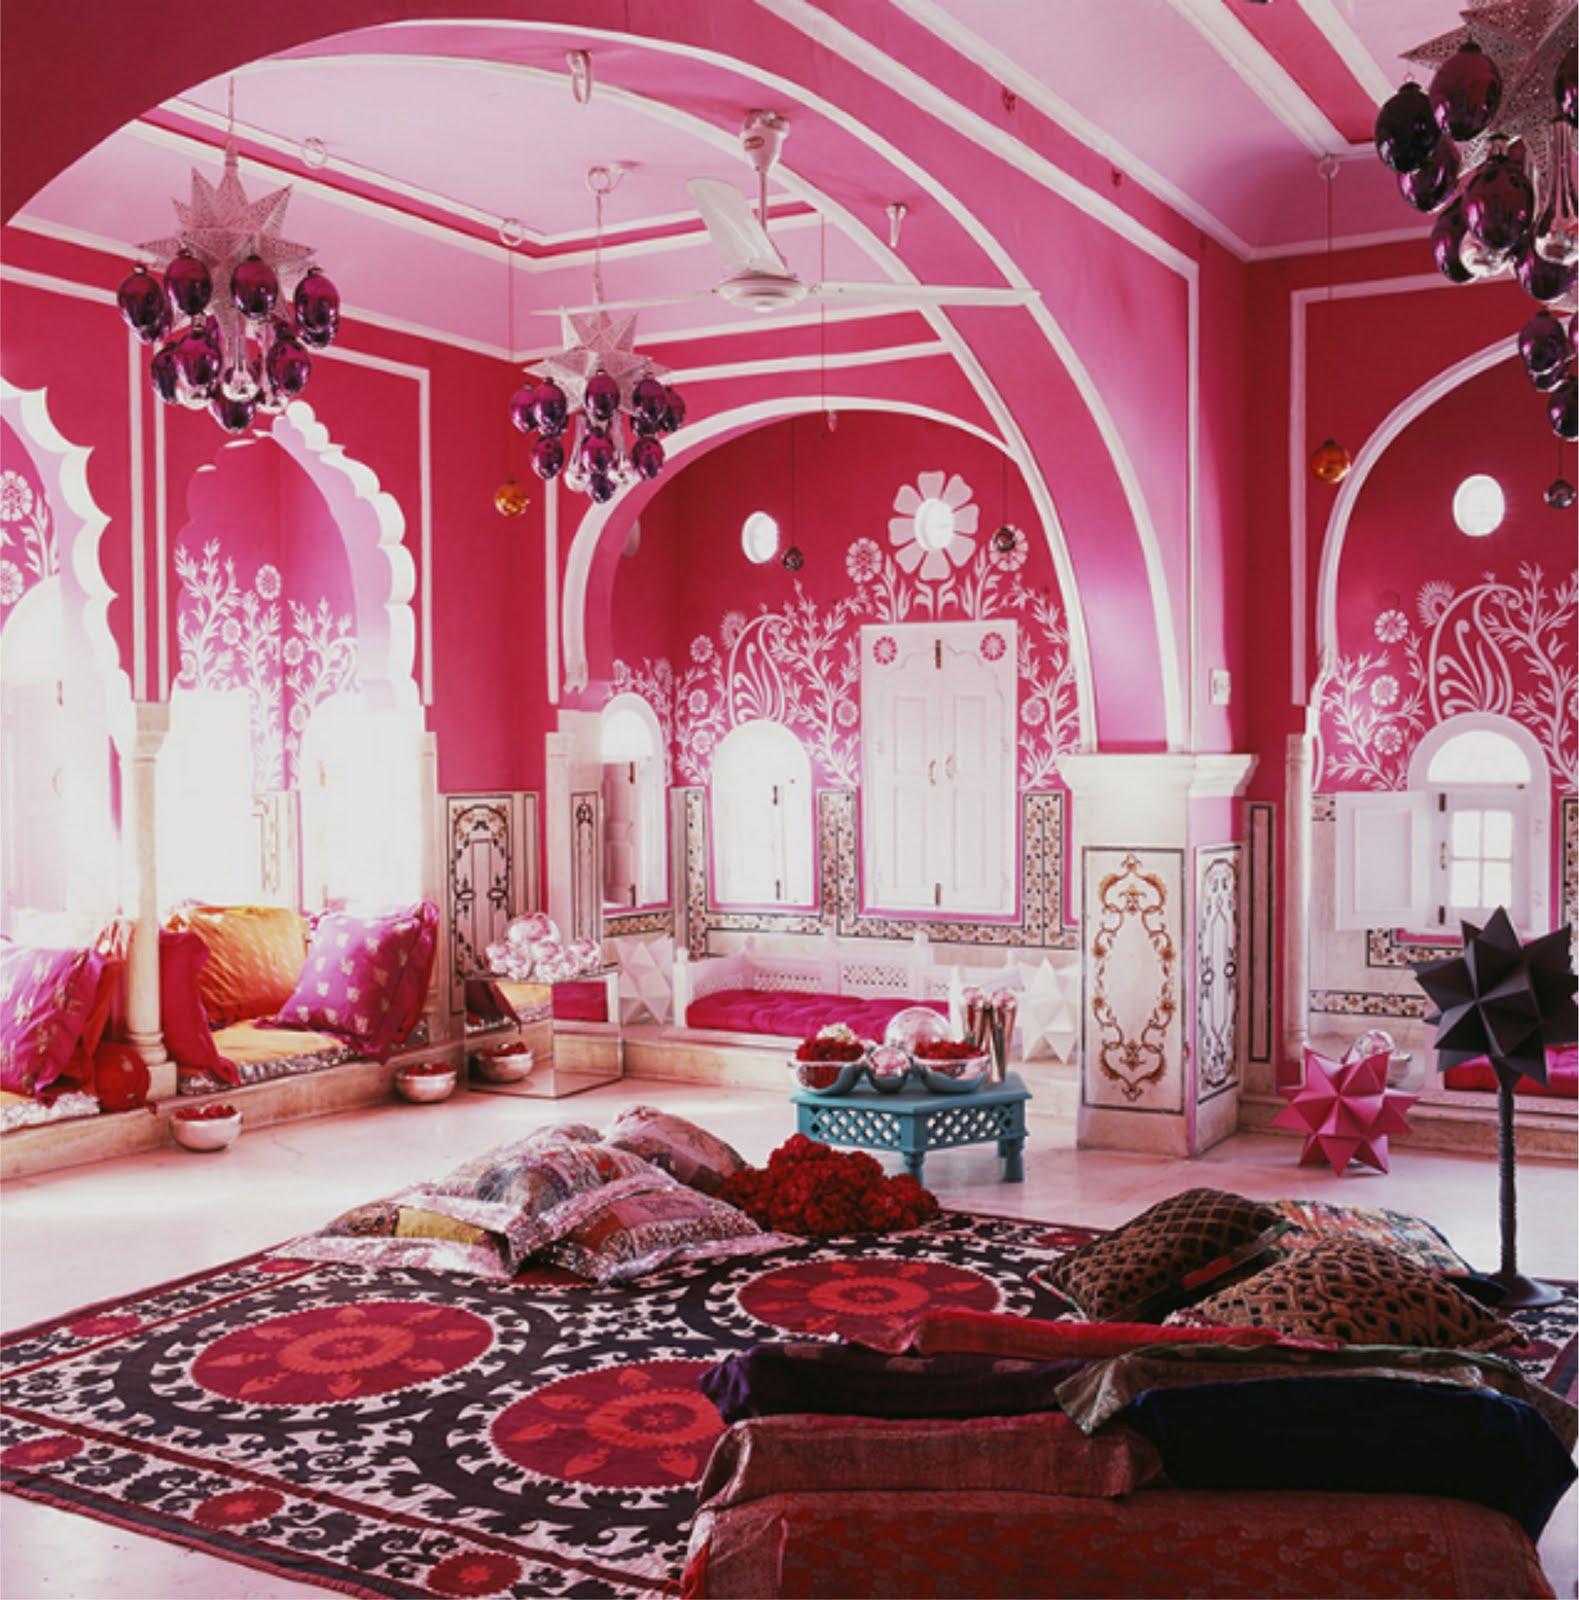 Interior Inspiration Morocco Delight Fleur De Londres